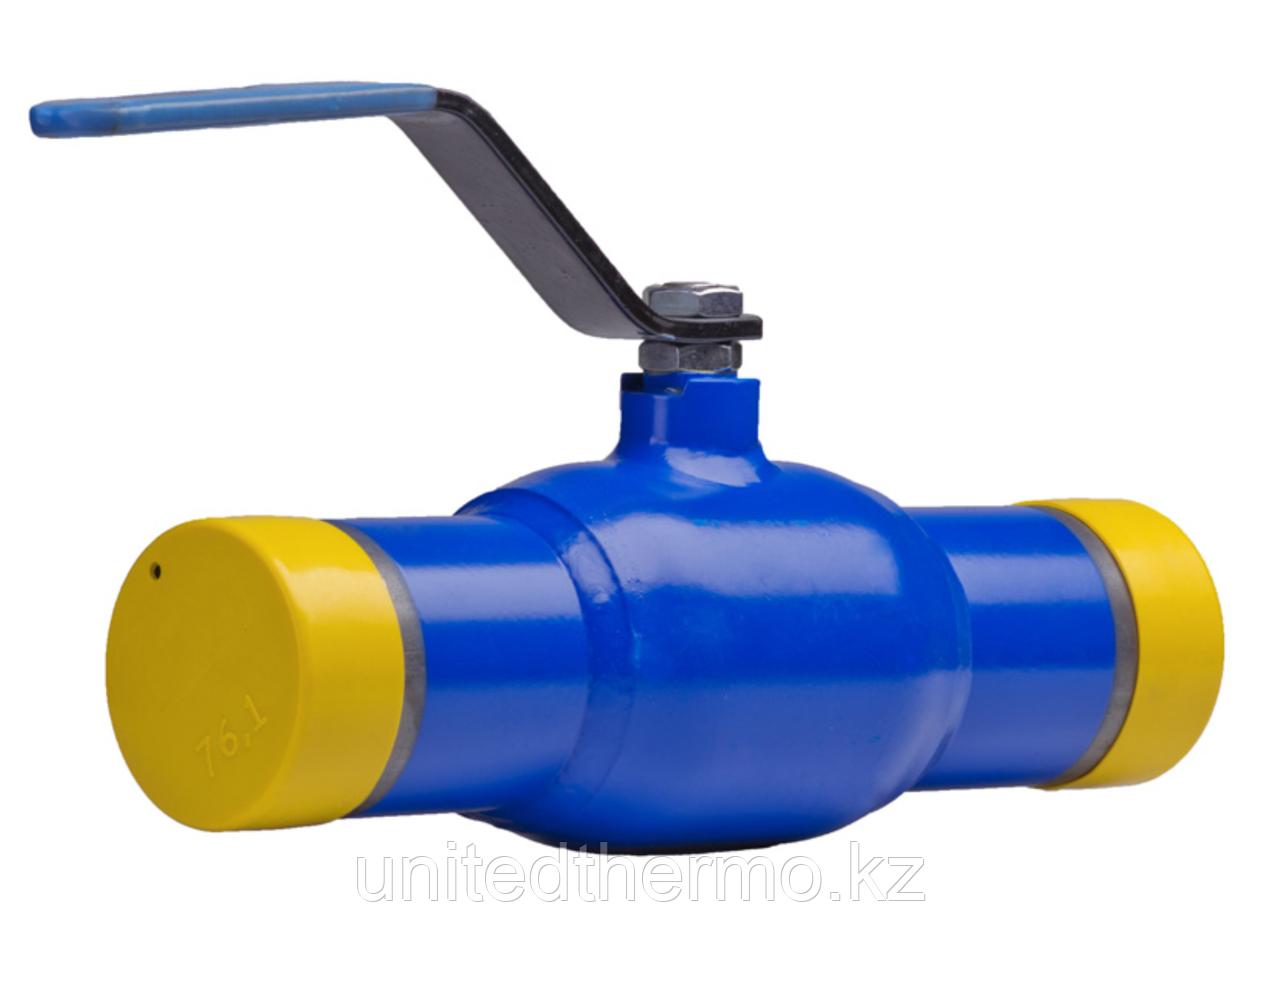 Кран сварной 25 мм EFAR